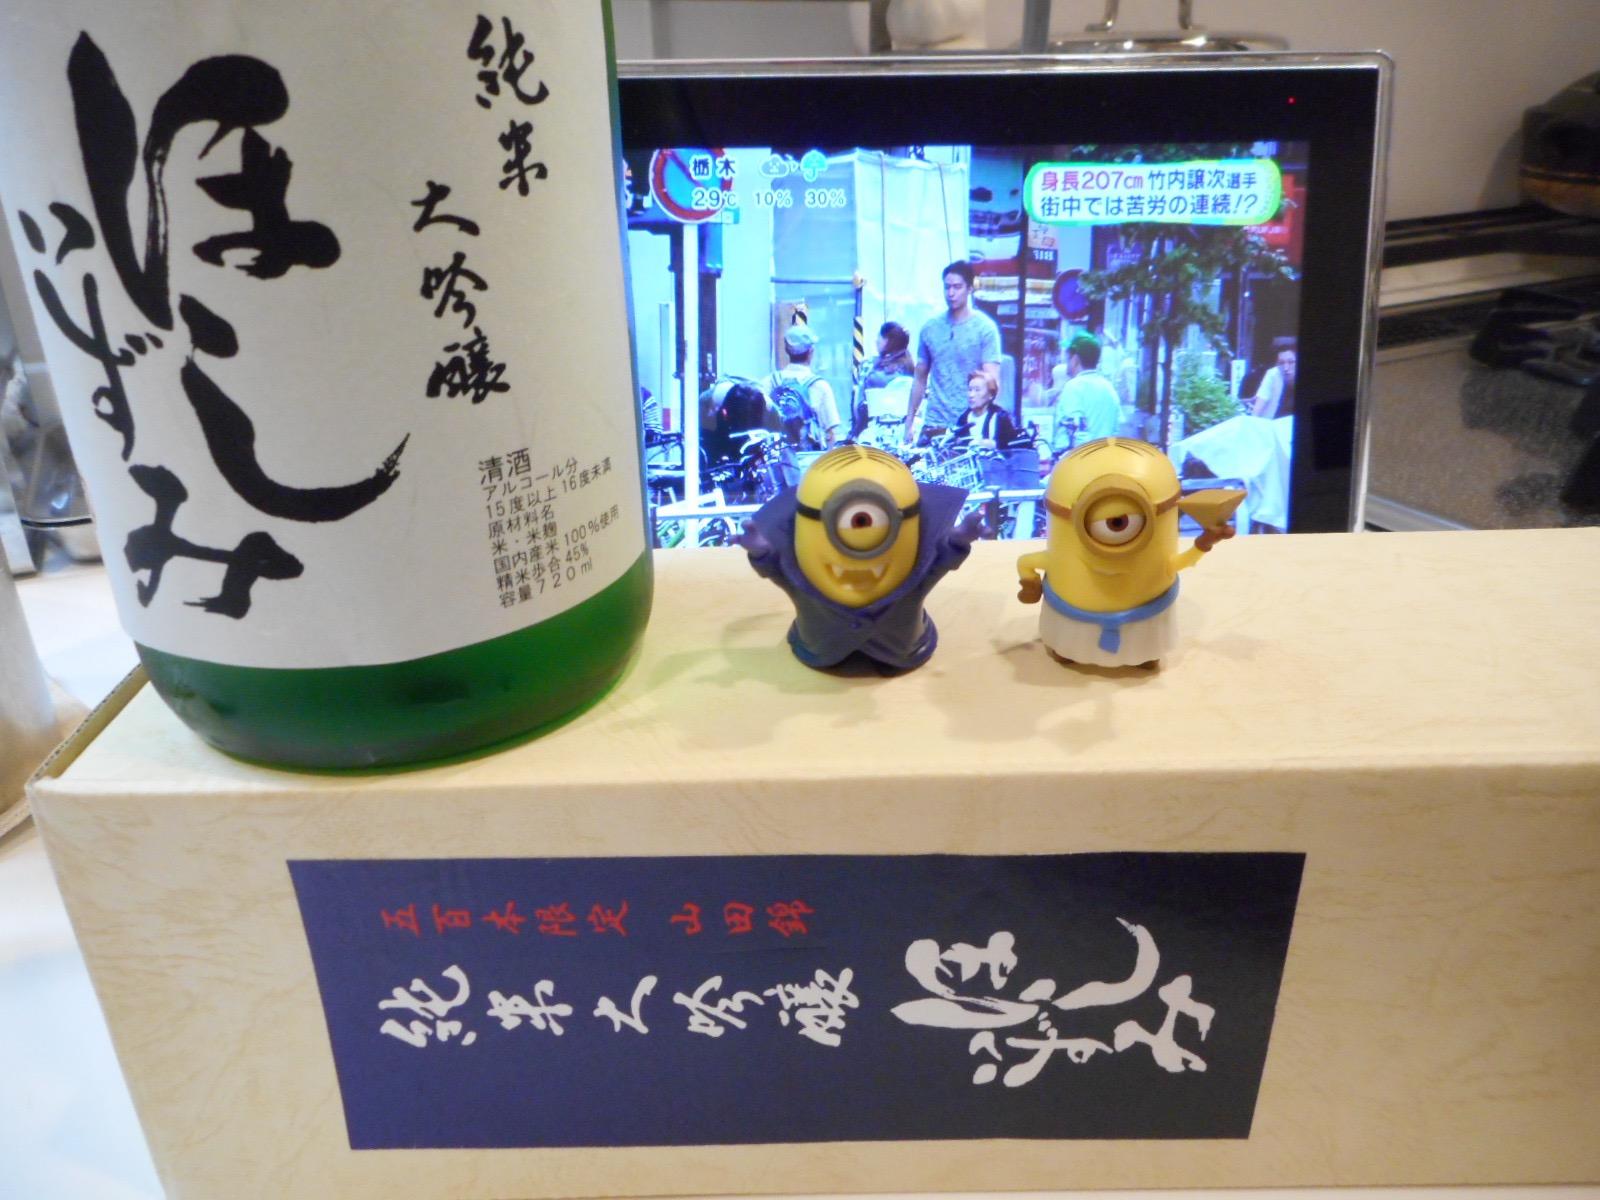 hoshiizumi_jundai_yamada45_27by5.jpg